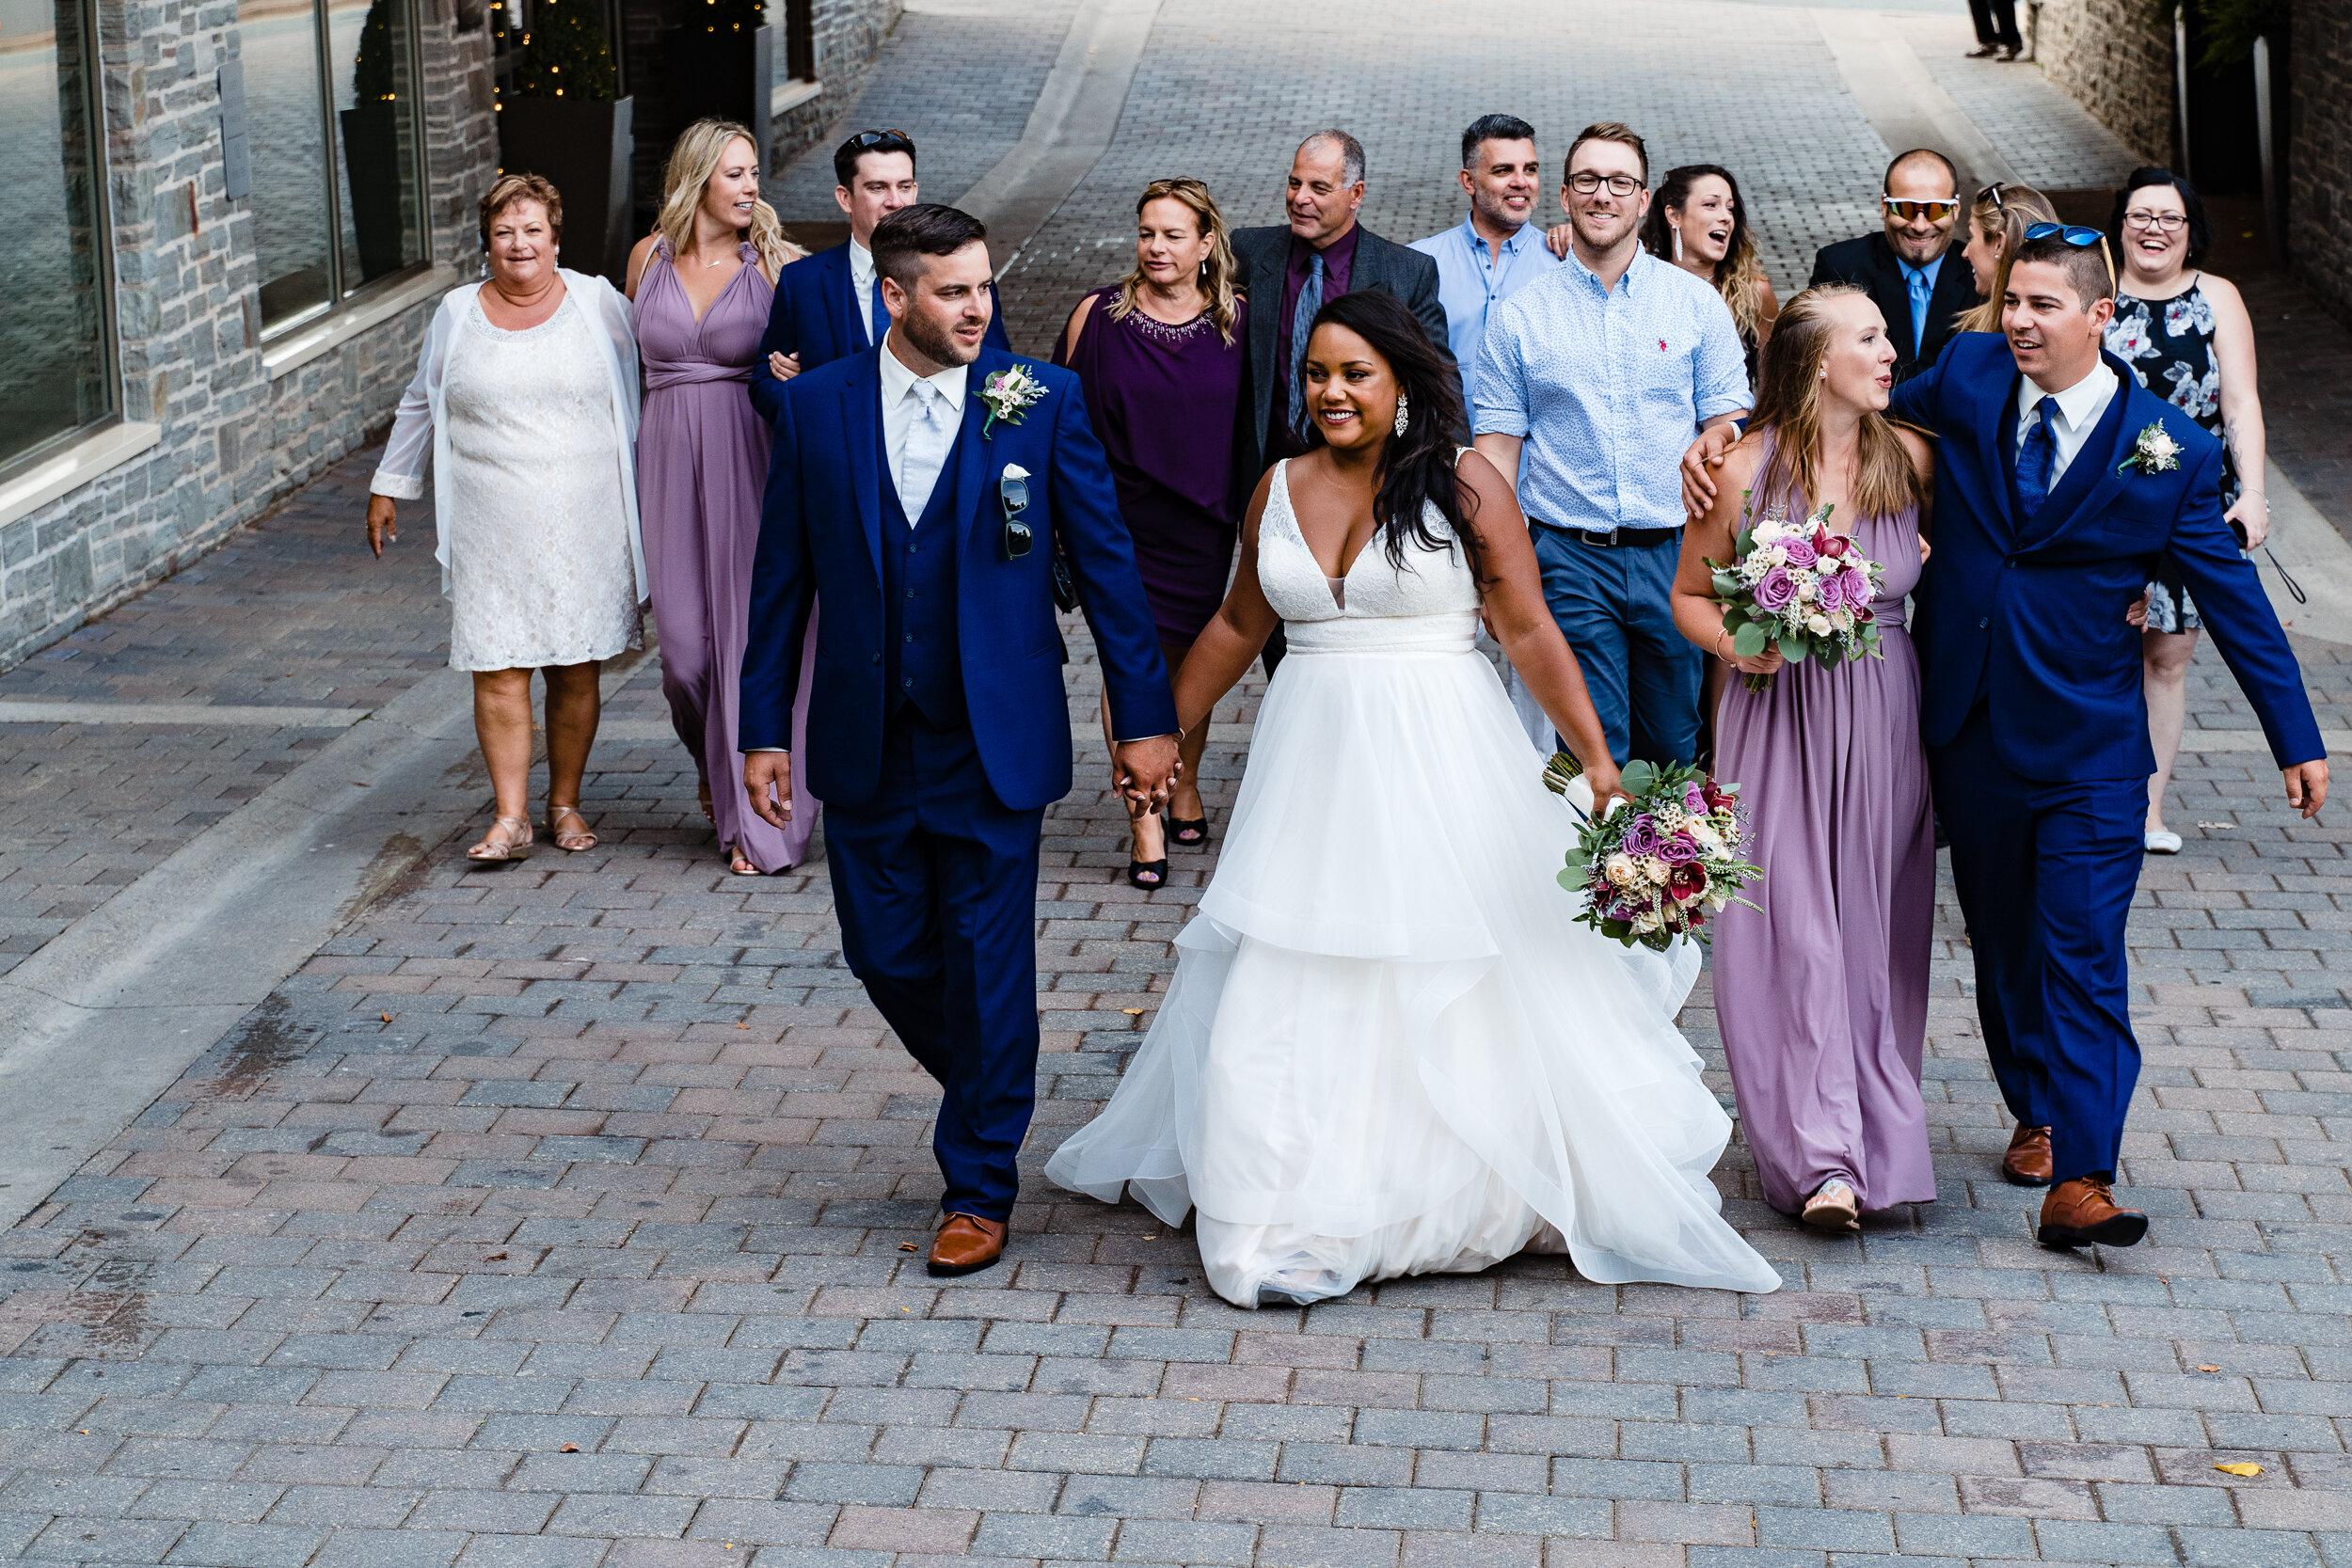 courtyard-marriot-wedding-halifax-39.jpg